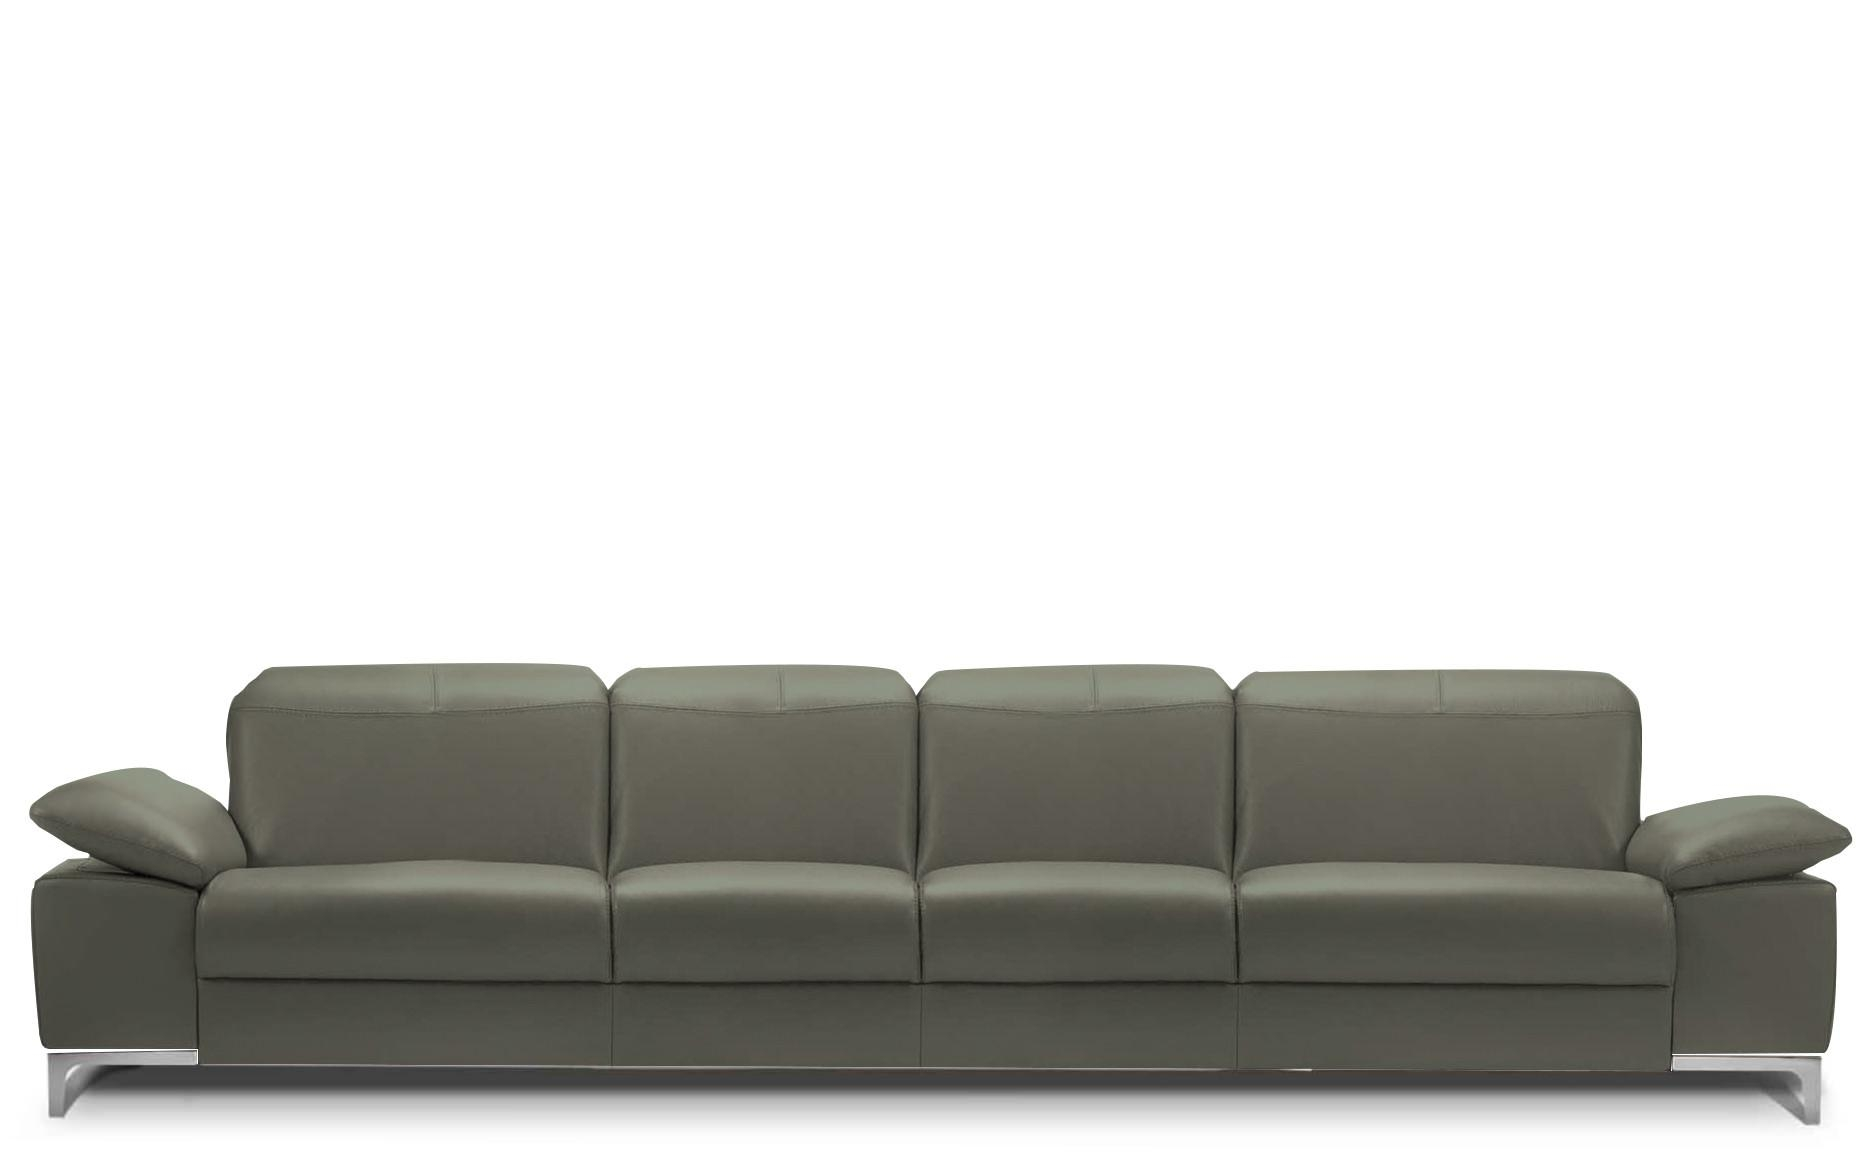 Rom Chronos 4 Seater Leather Sofa | Buy At Kontenta Regarding 4 Seat Sofas (View 6 of 20)